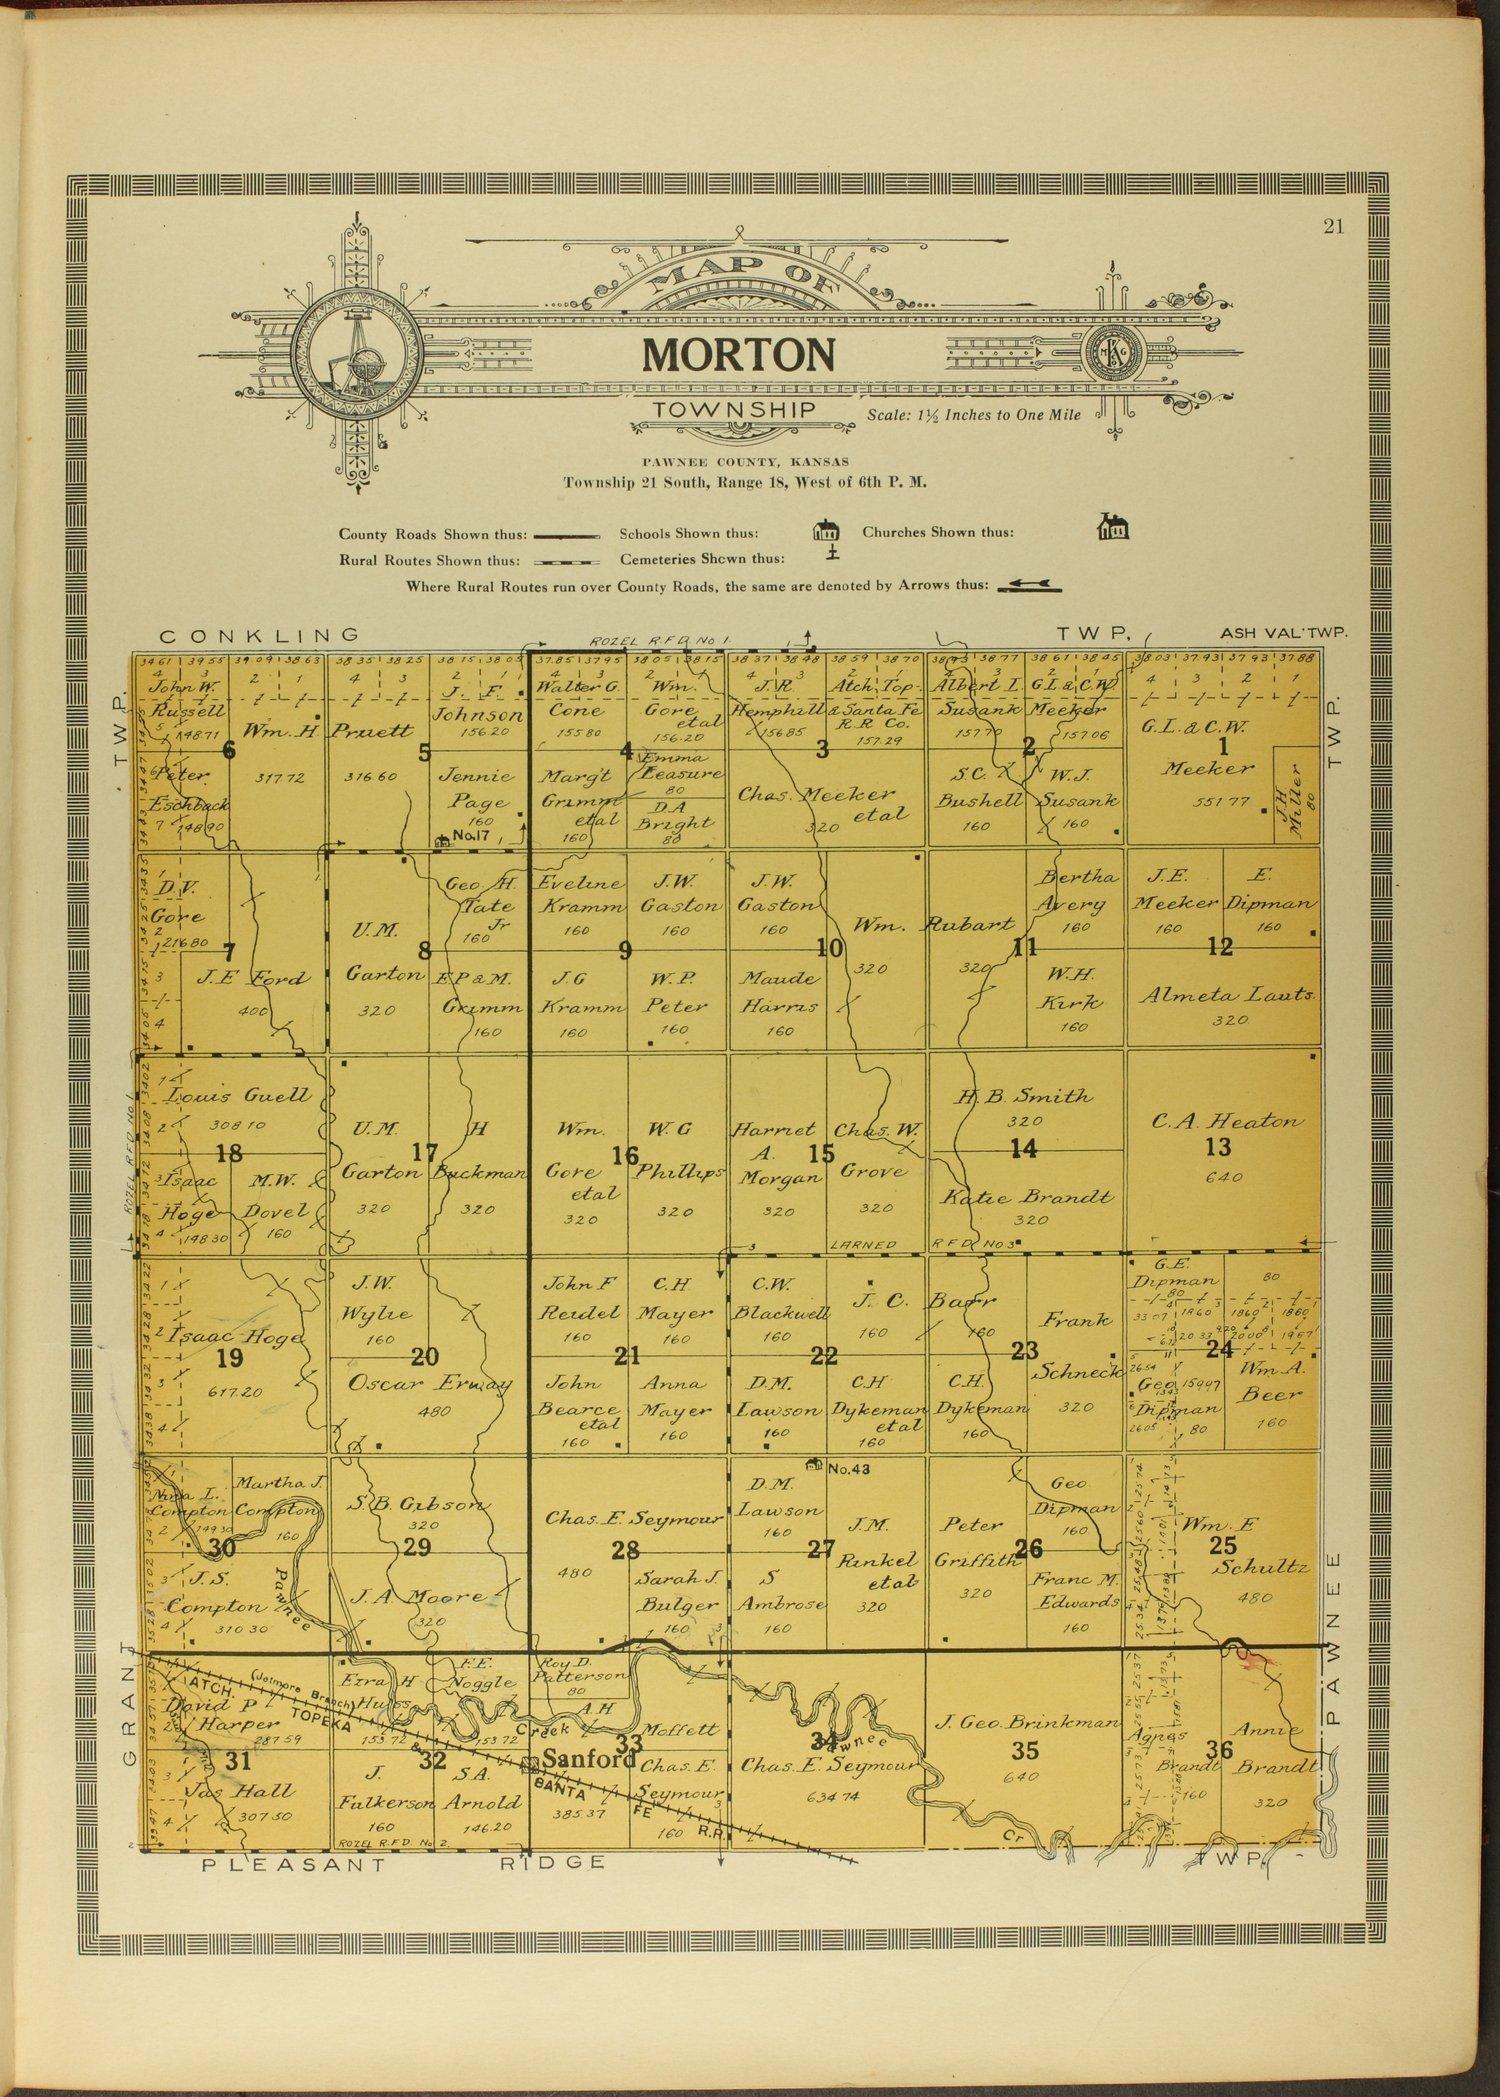 Atlas and plat book of Pawnee County, Kansas - 21